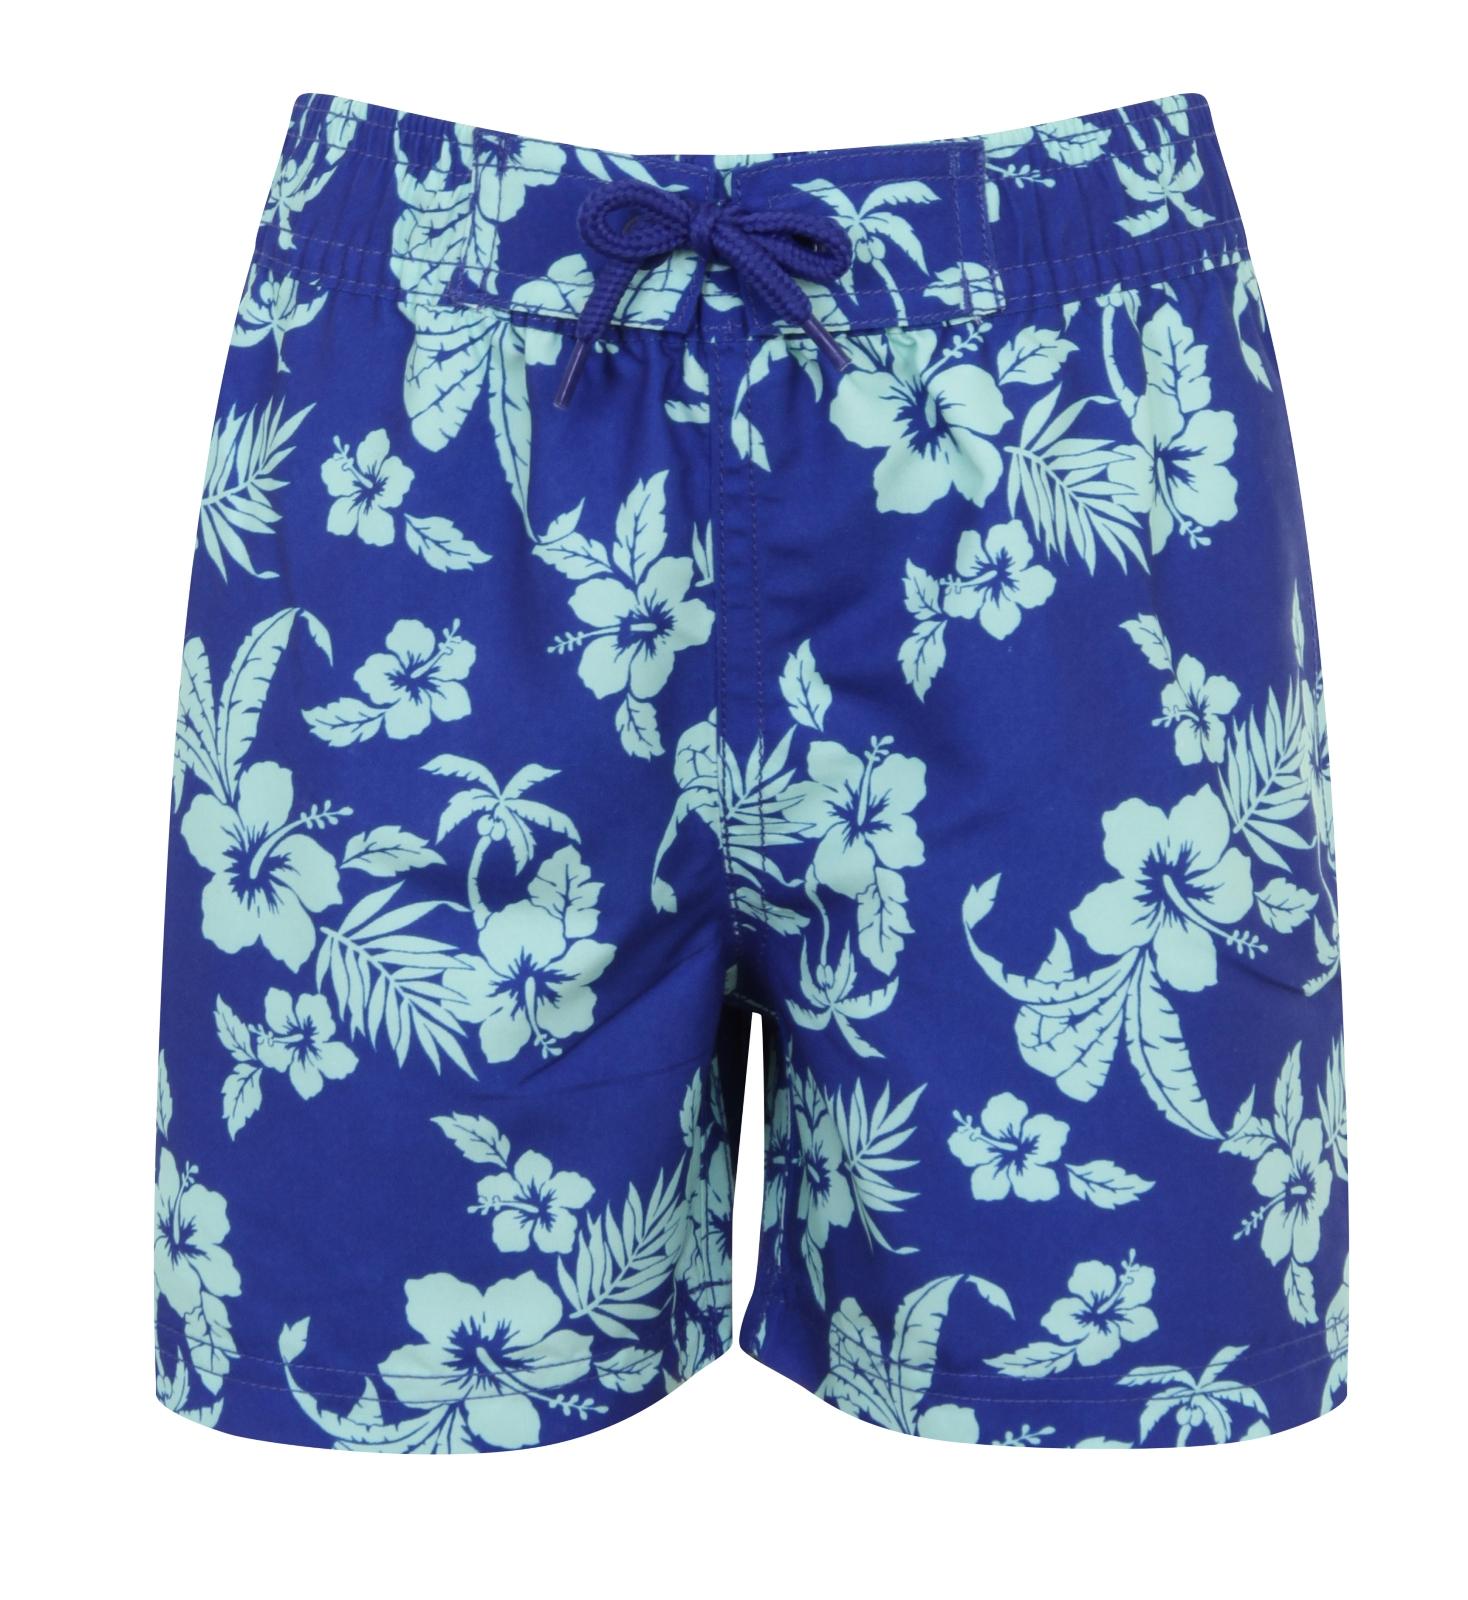 334757c9e7 Boys Swim Shorts Swimming Trunks Casual Beach Holiday Board Swimwear ...